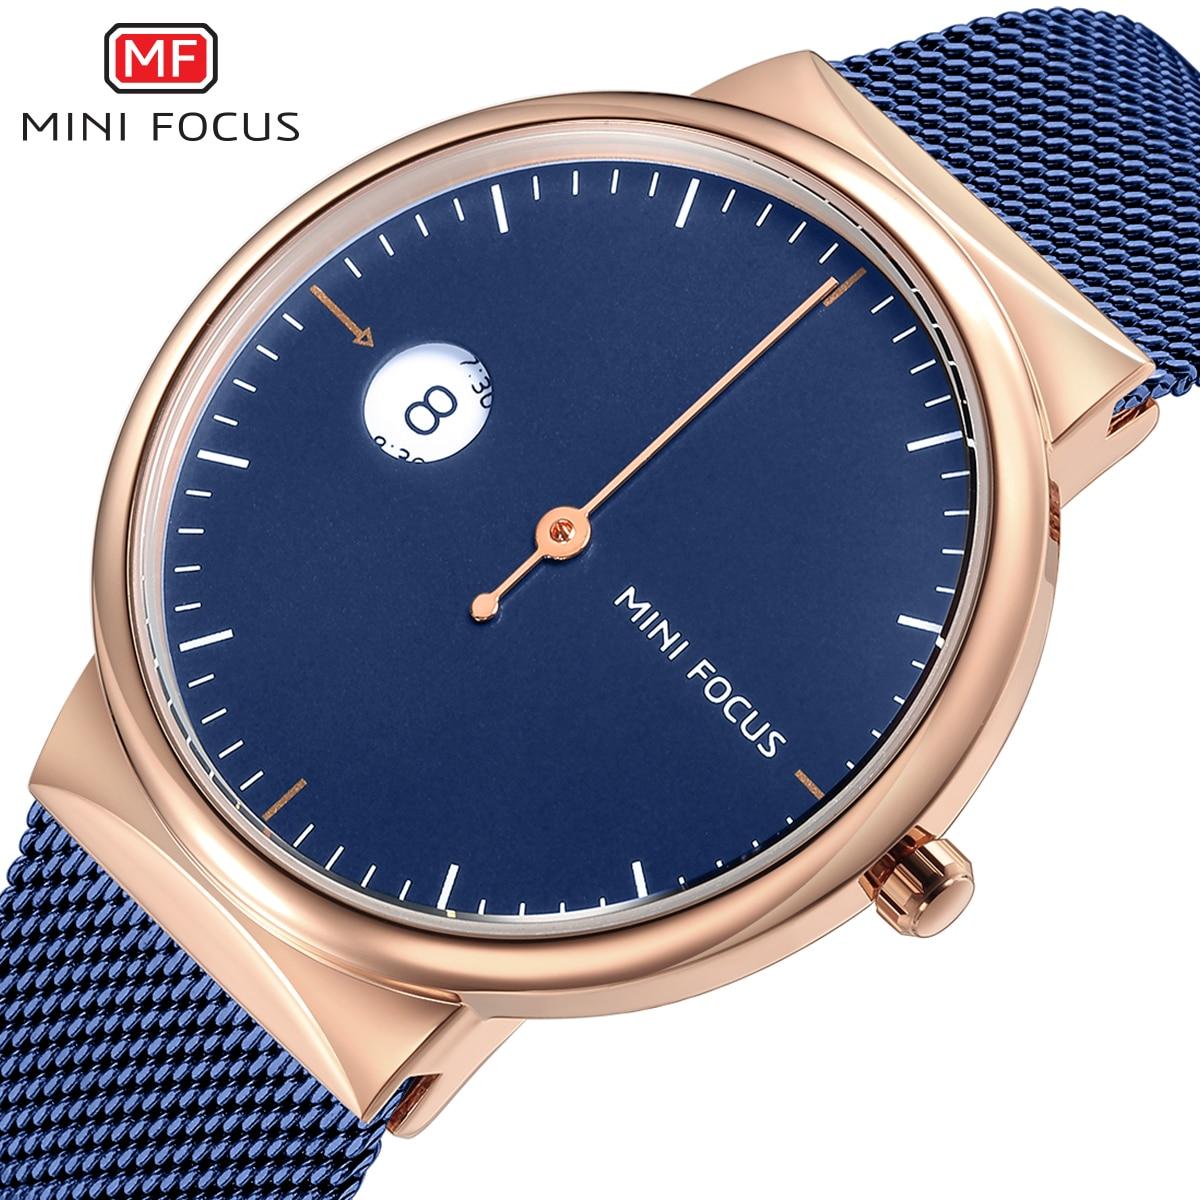 MINIFOCUS Brand Luxury Blue Quartz Watch Men Ultra Thin Steel Mesh Strap Auto Date Unique Single Hand Fashion Simple Wristwatches